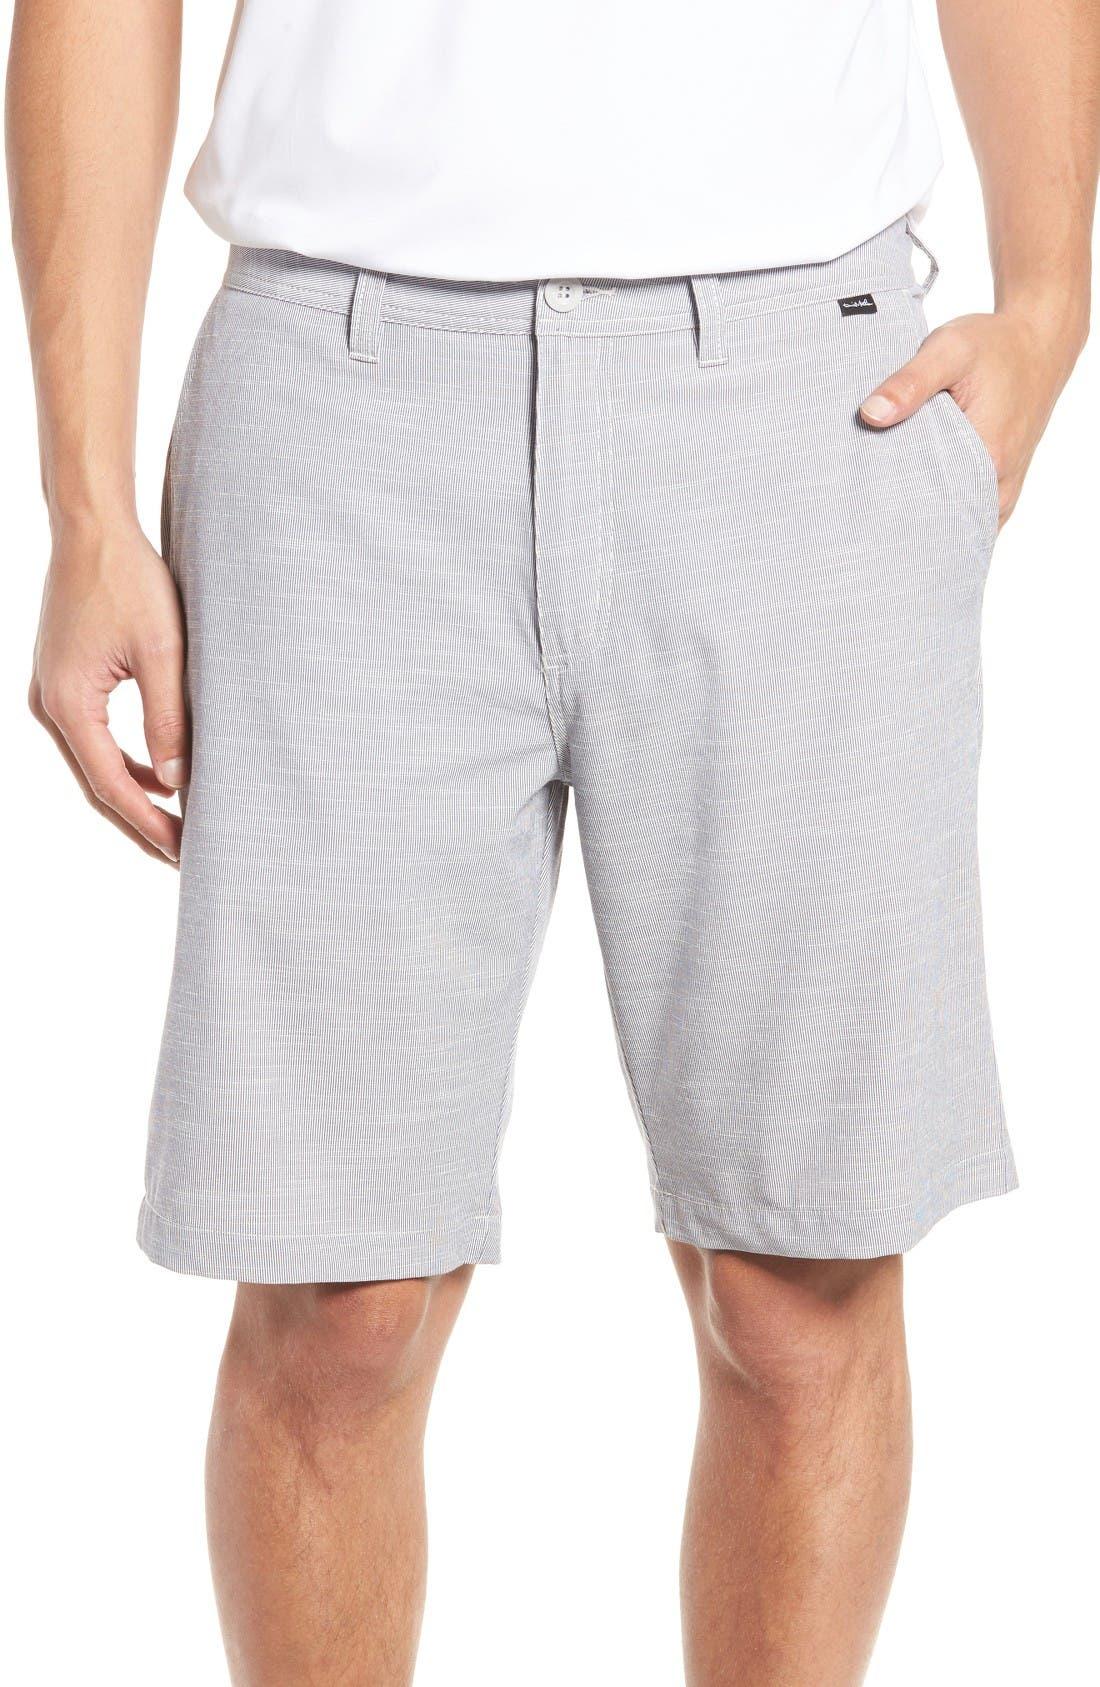 Travis Mathew St. George Stretch Shorts